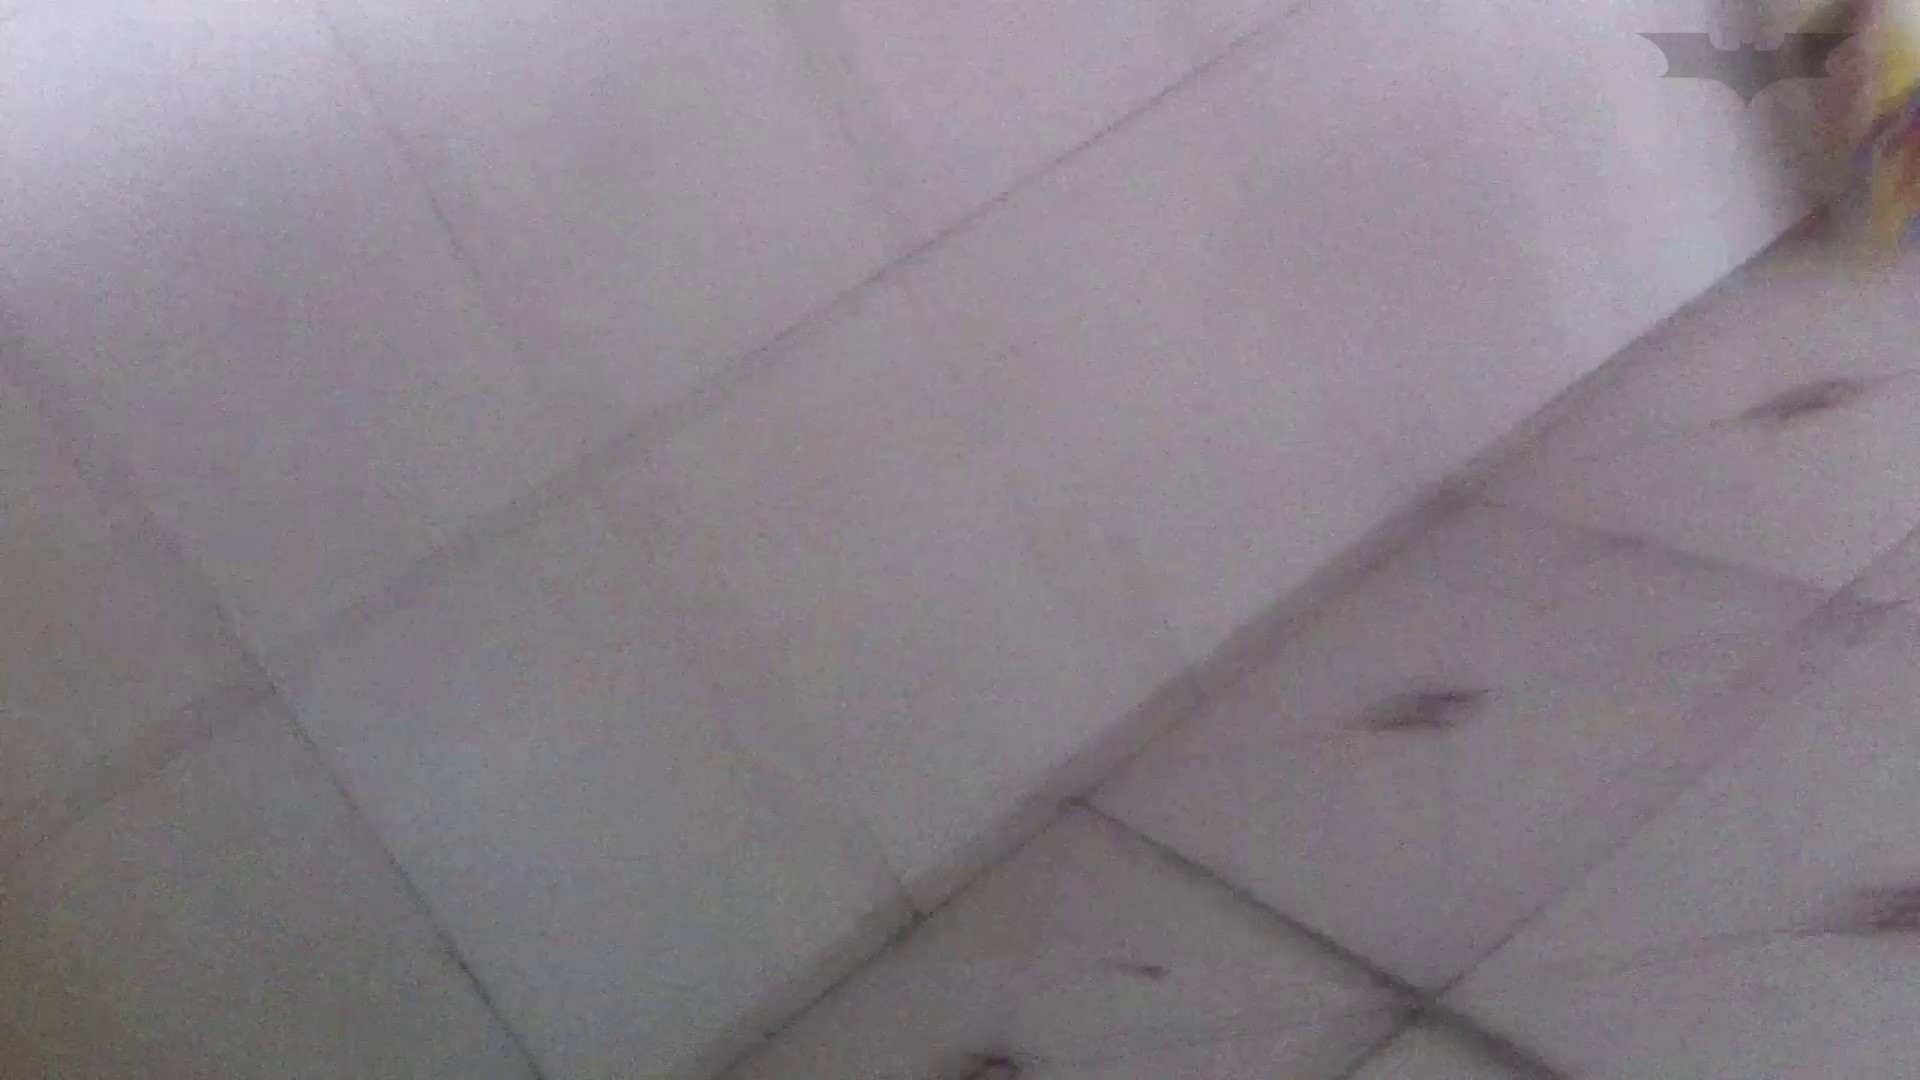 JD盗撮 美女の洗面所の秘密 Vol.67 丸見え セックス無修正動画無料 55画像 13